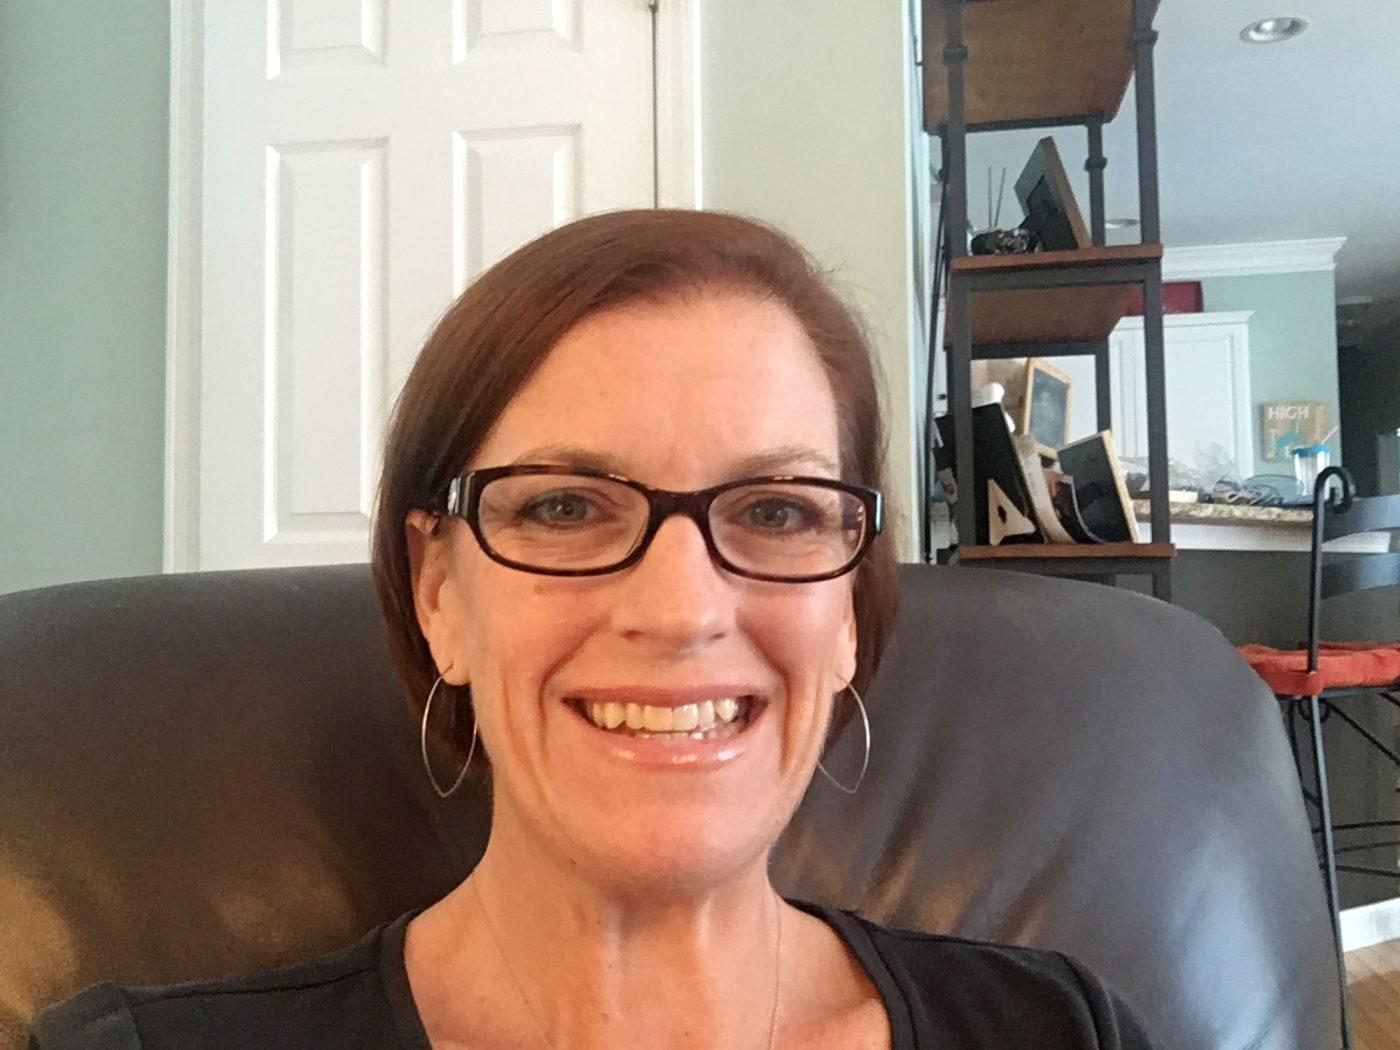 Melanie Cameron - Reasons a Home Sells